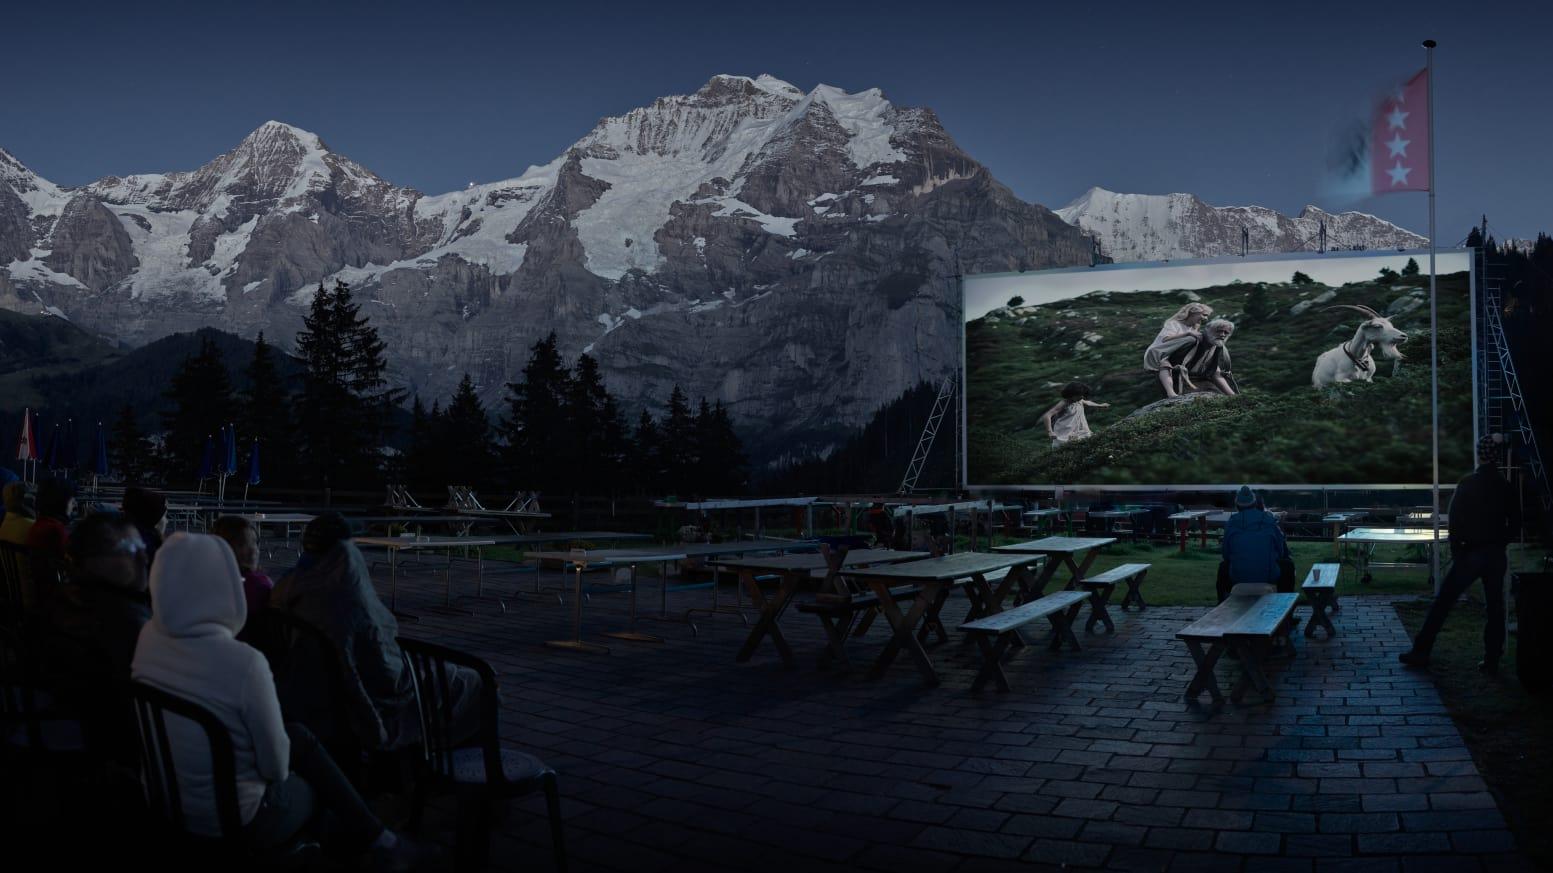 WEBSEITE_Winteregg-Mürren